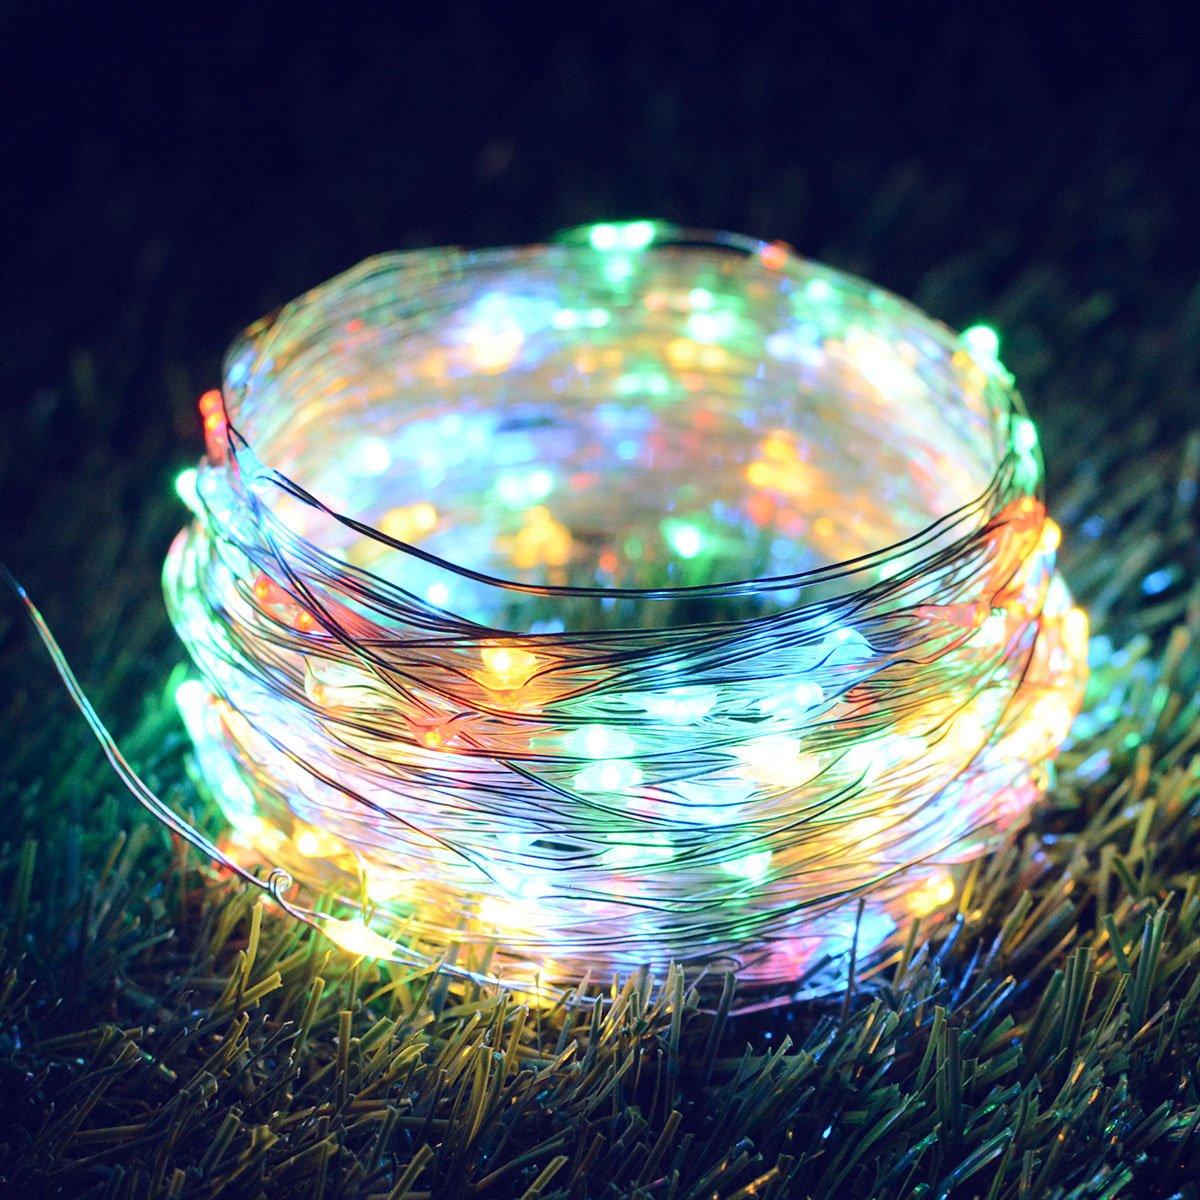 Amazon.com : Binval Solar String Lights, 72ft 200Led, Copper Wire ...